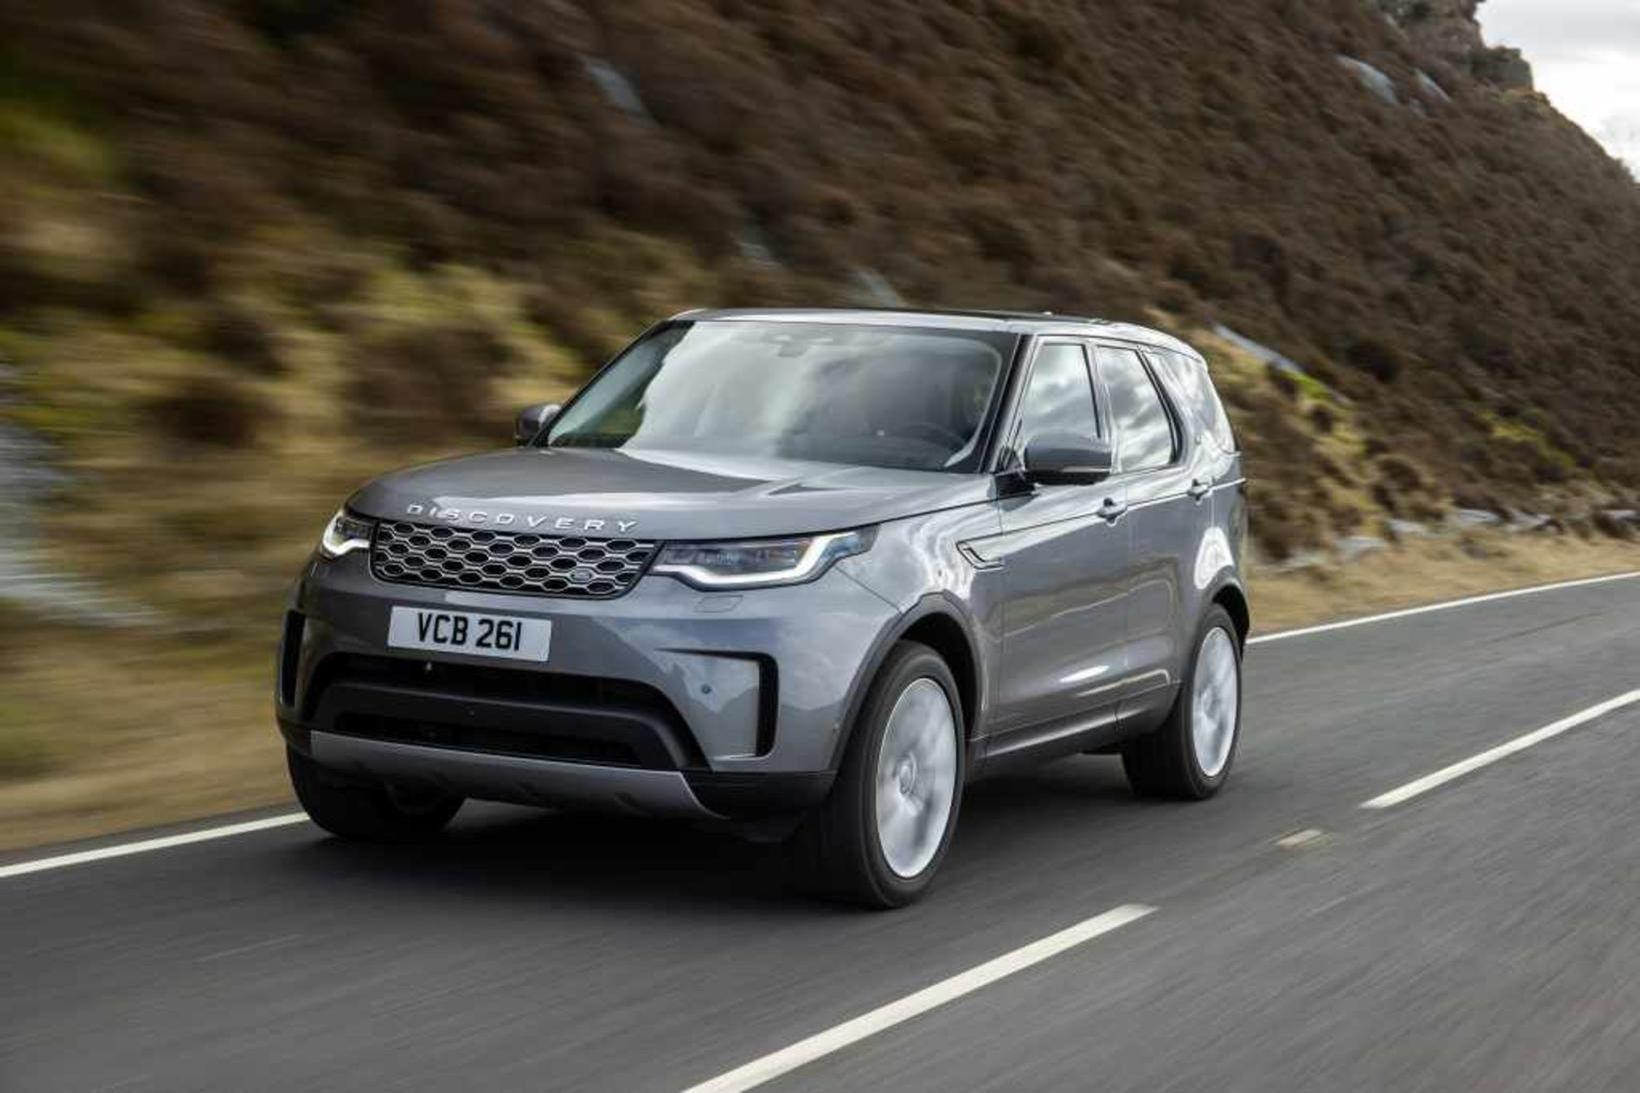 Breyttur Land Rover Discovery 5.